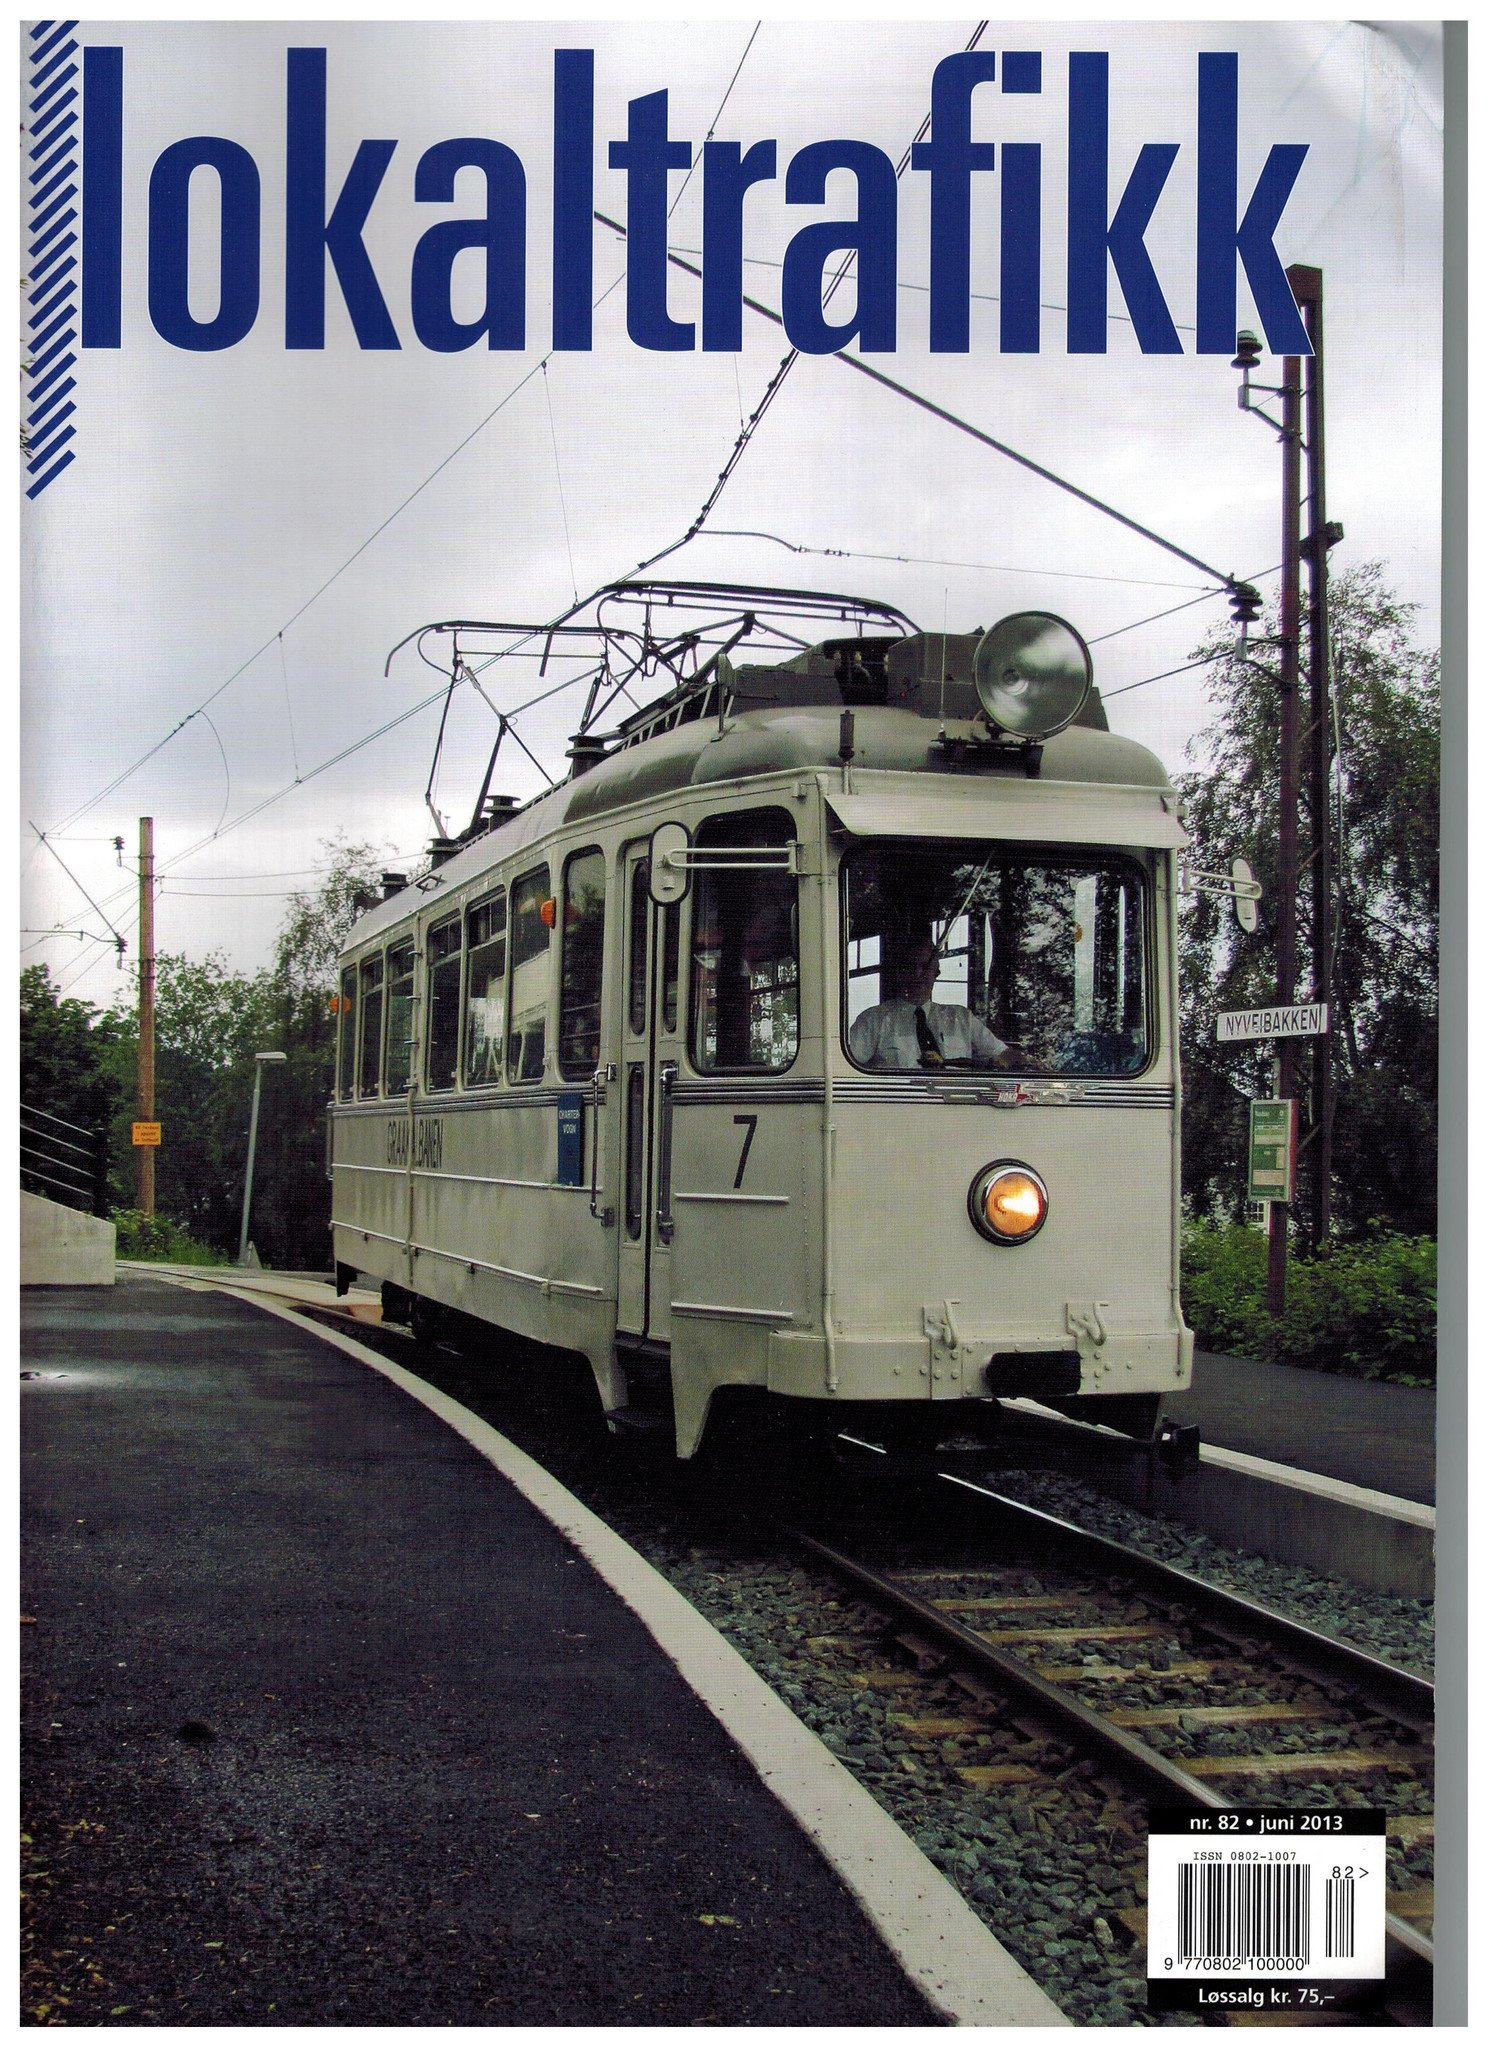 Lokaltrafikk #082